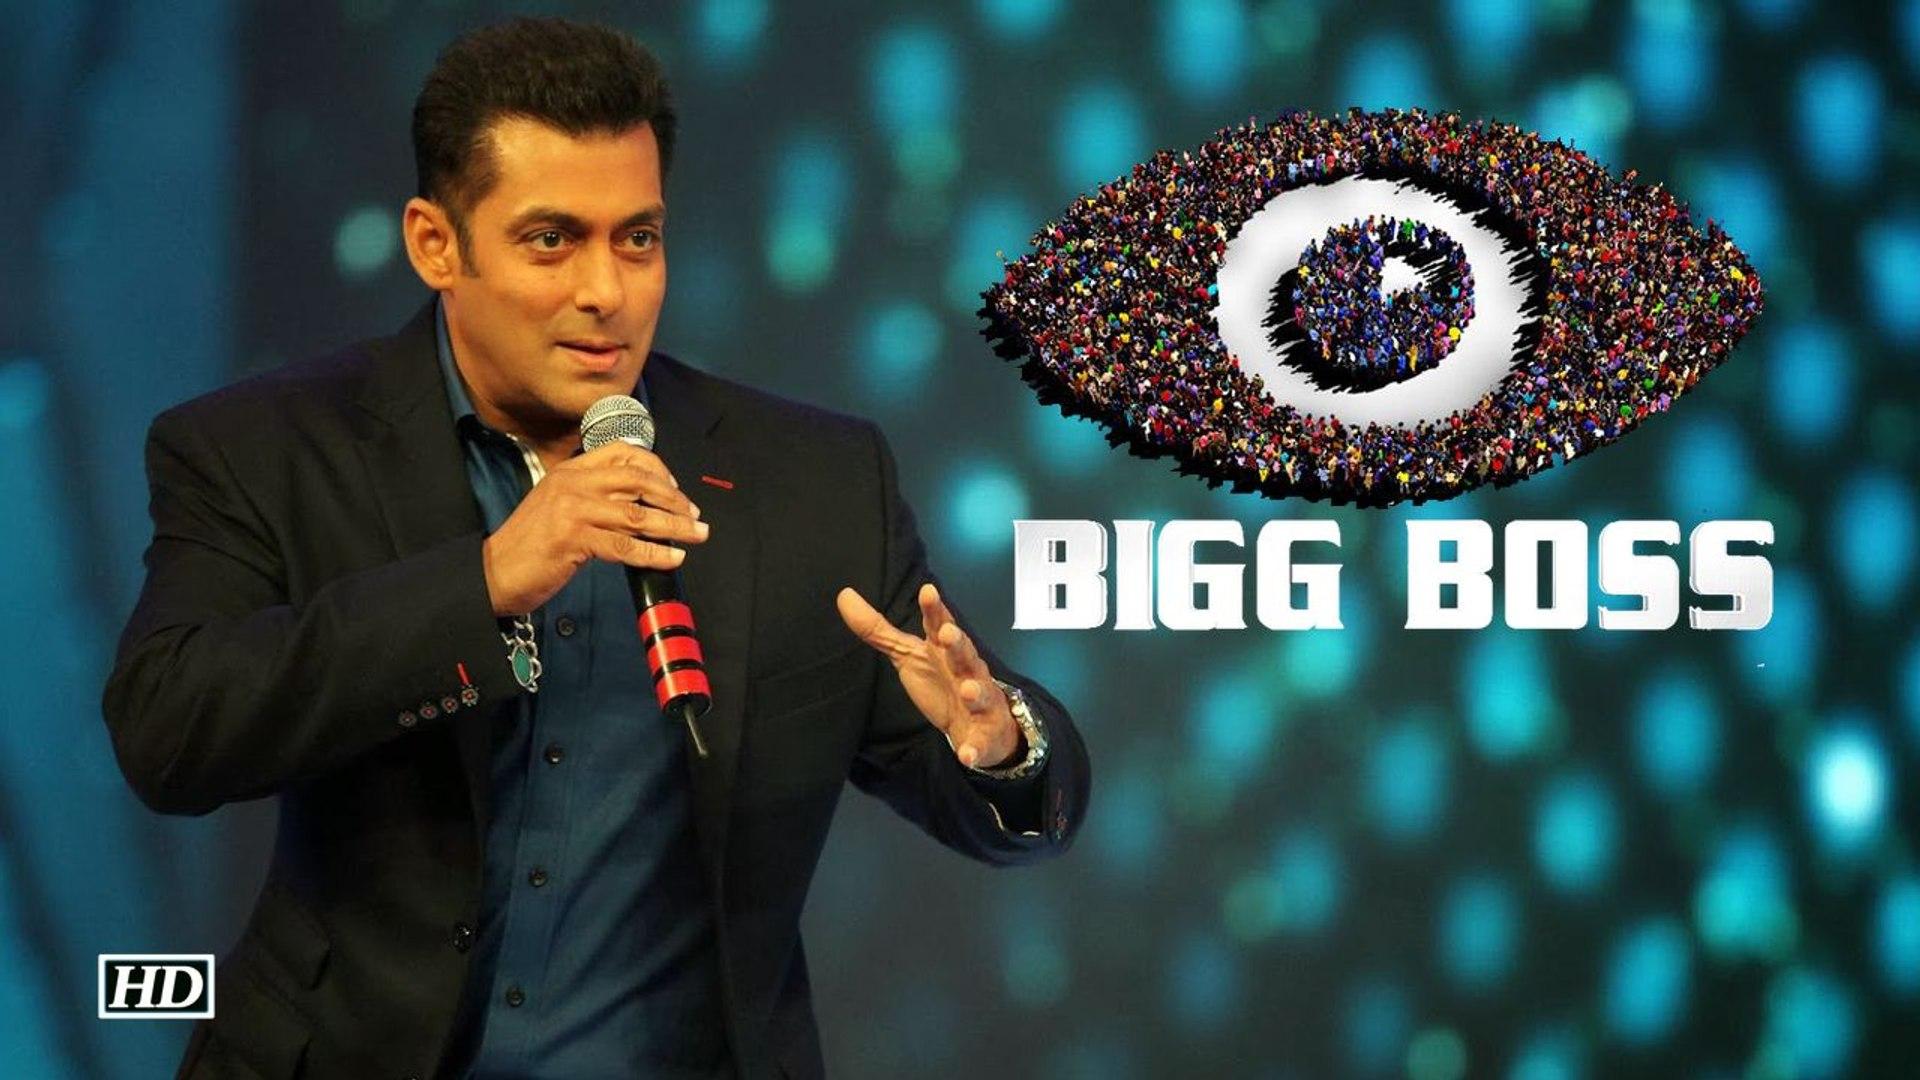 Bigg Boss 10 Salman Khan REVEALS Biggest SURPRISES